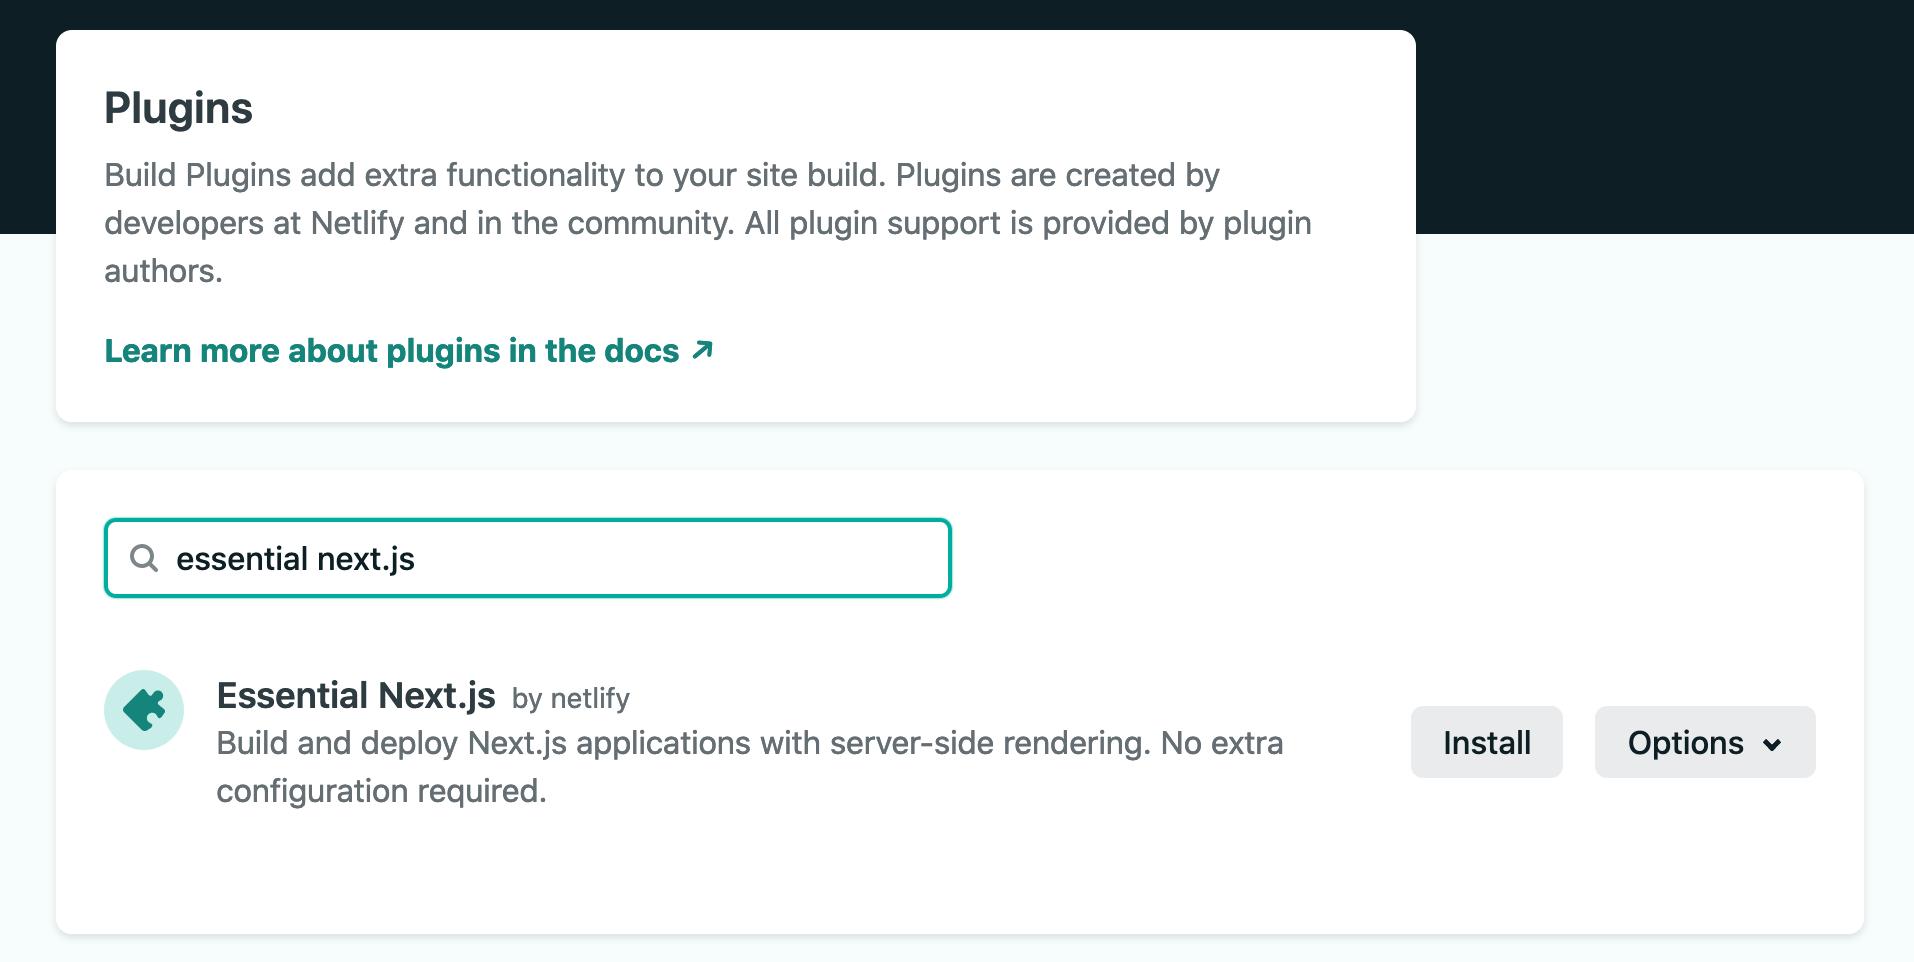 Install the Essential Next.js plugin